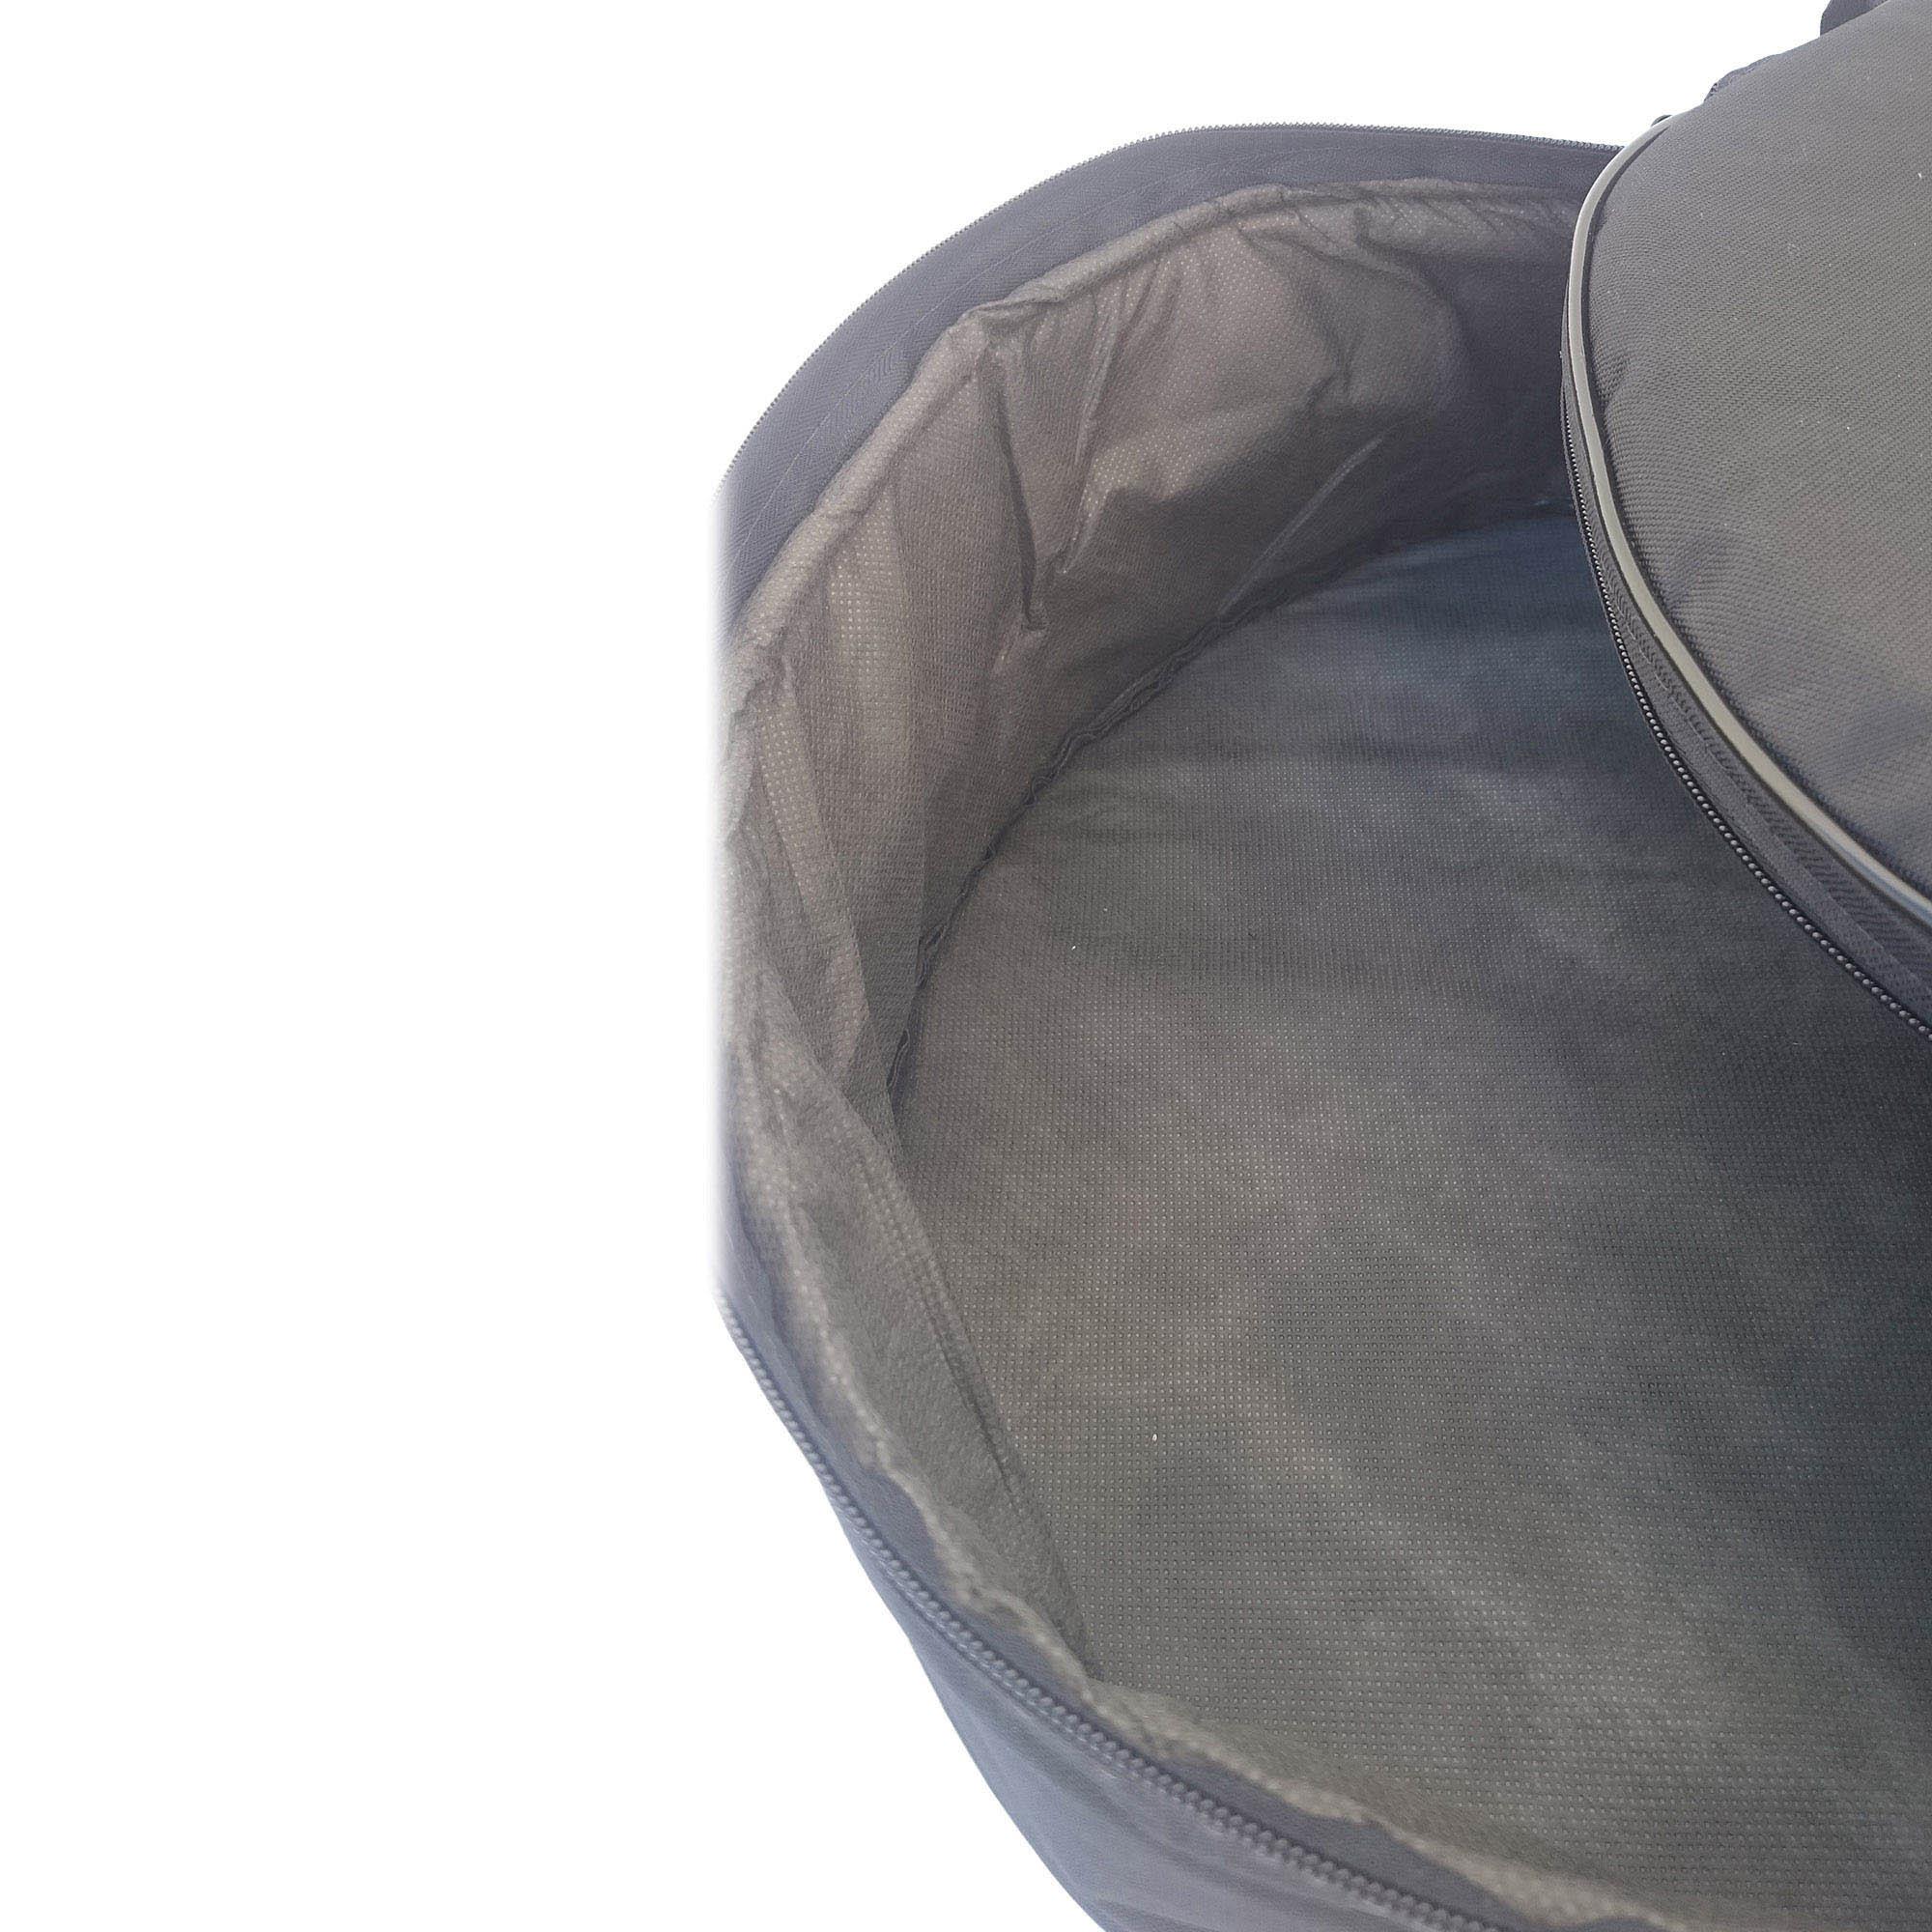 "CAPA BAG DE 08"" x 12 cm PARA CAIXA DE BATERIA DA CLAVE & BAG. TOTALMENTE ACOLCHOADA- SUPER LUXO"